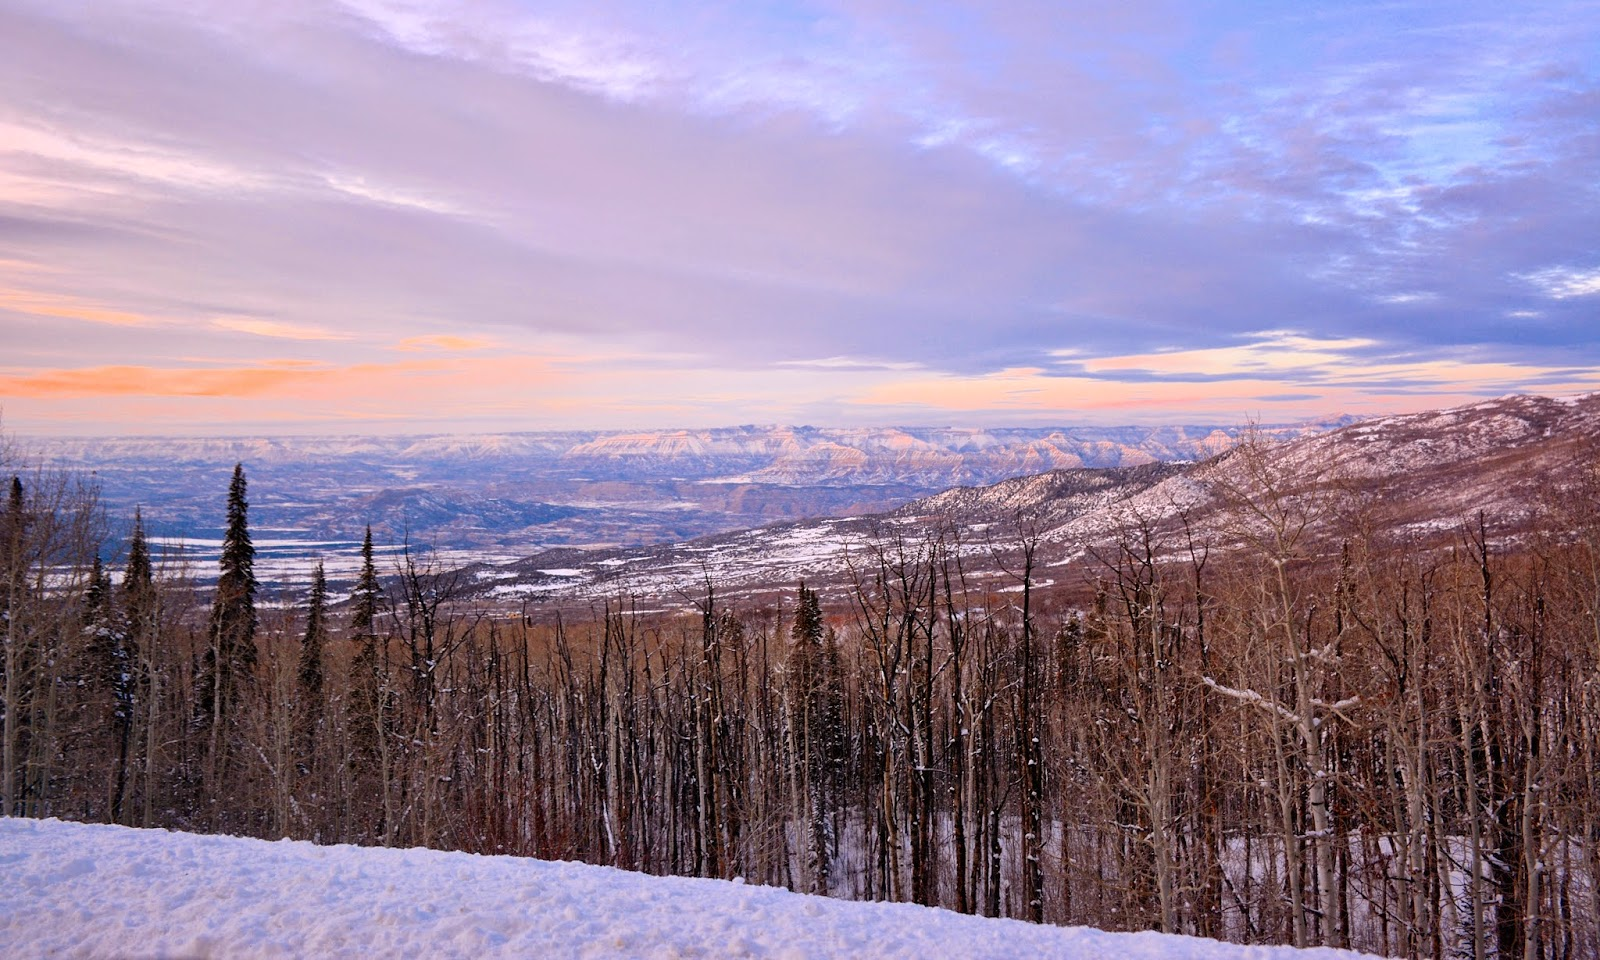 Sunset in western Colorado